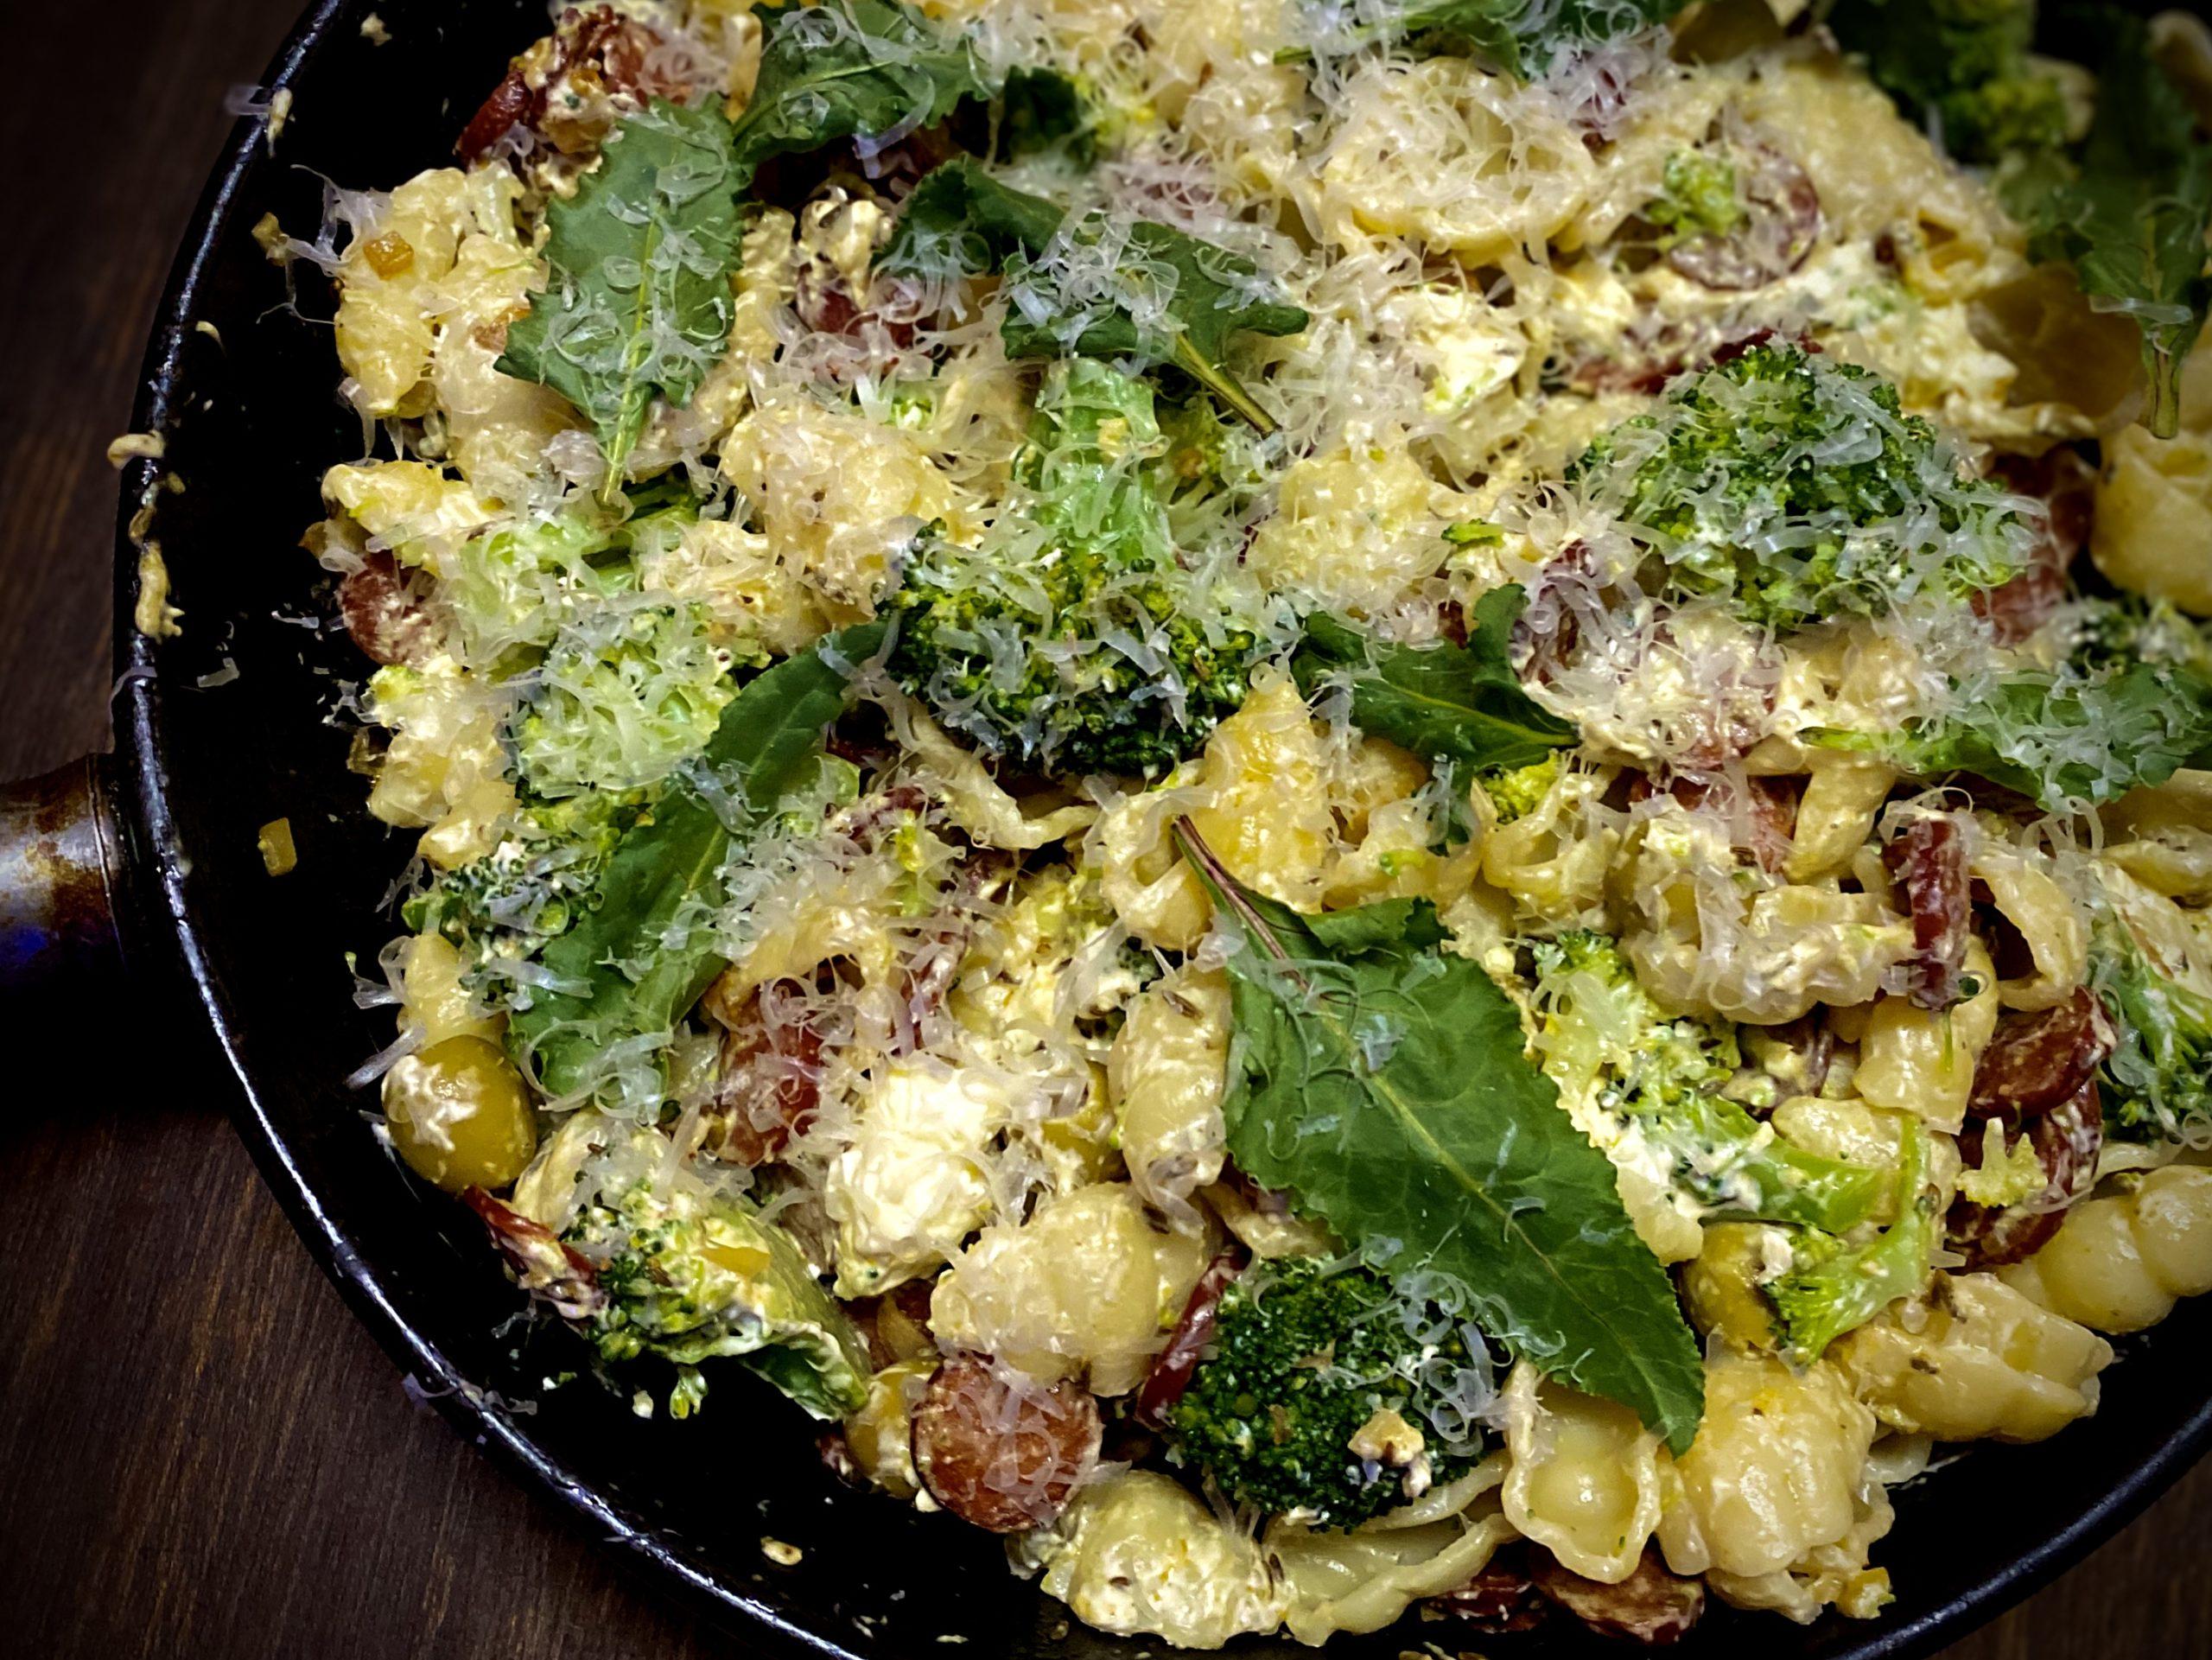 TGIFOOD: Lockdown Recipe of the Day: Chorizo, fennel seed and broccoli pasta